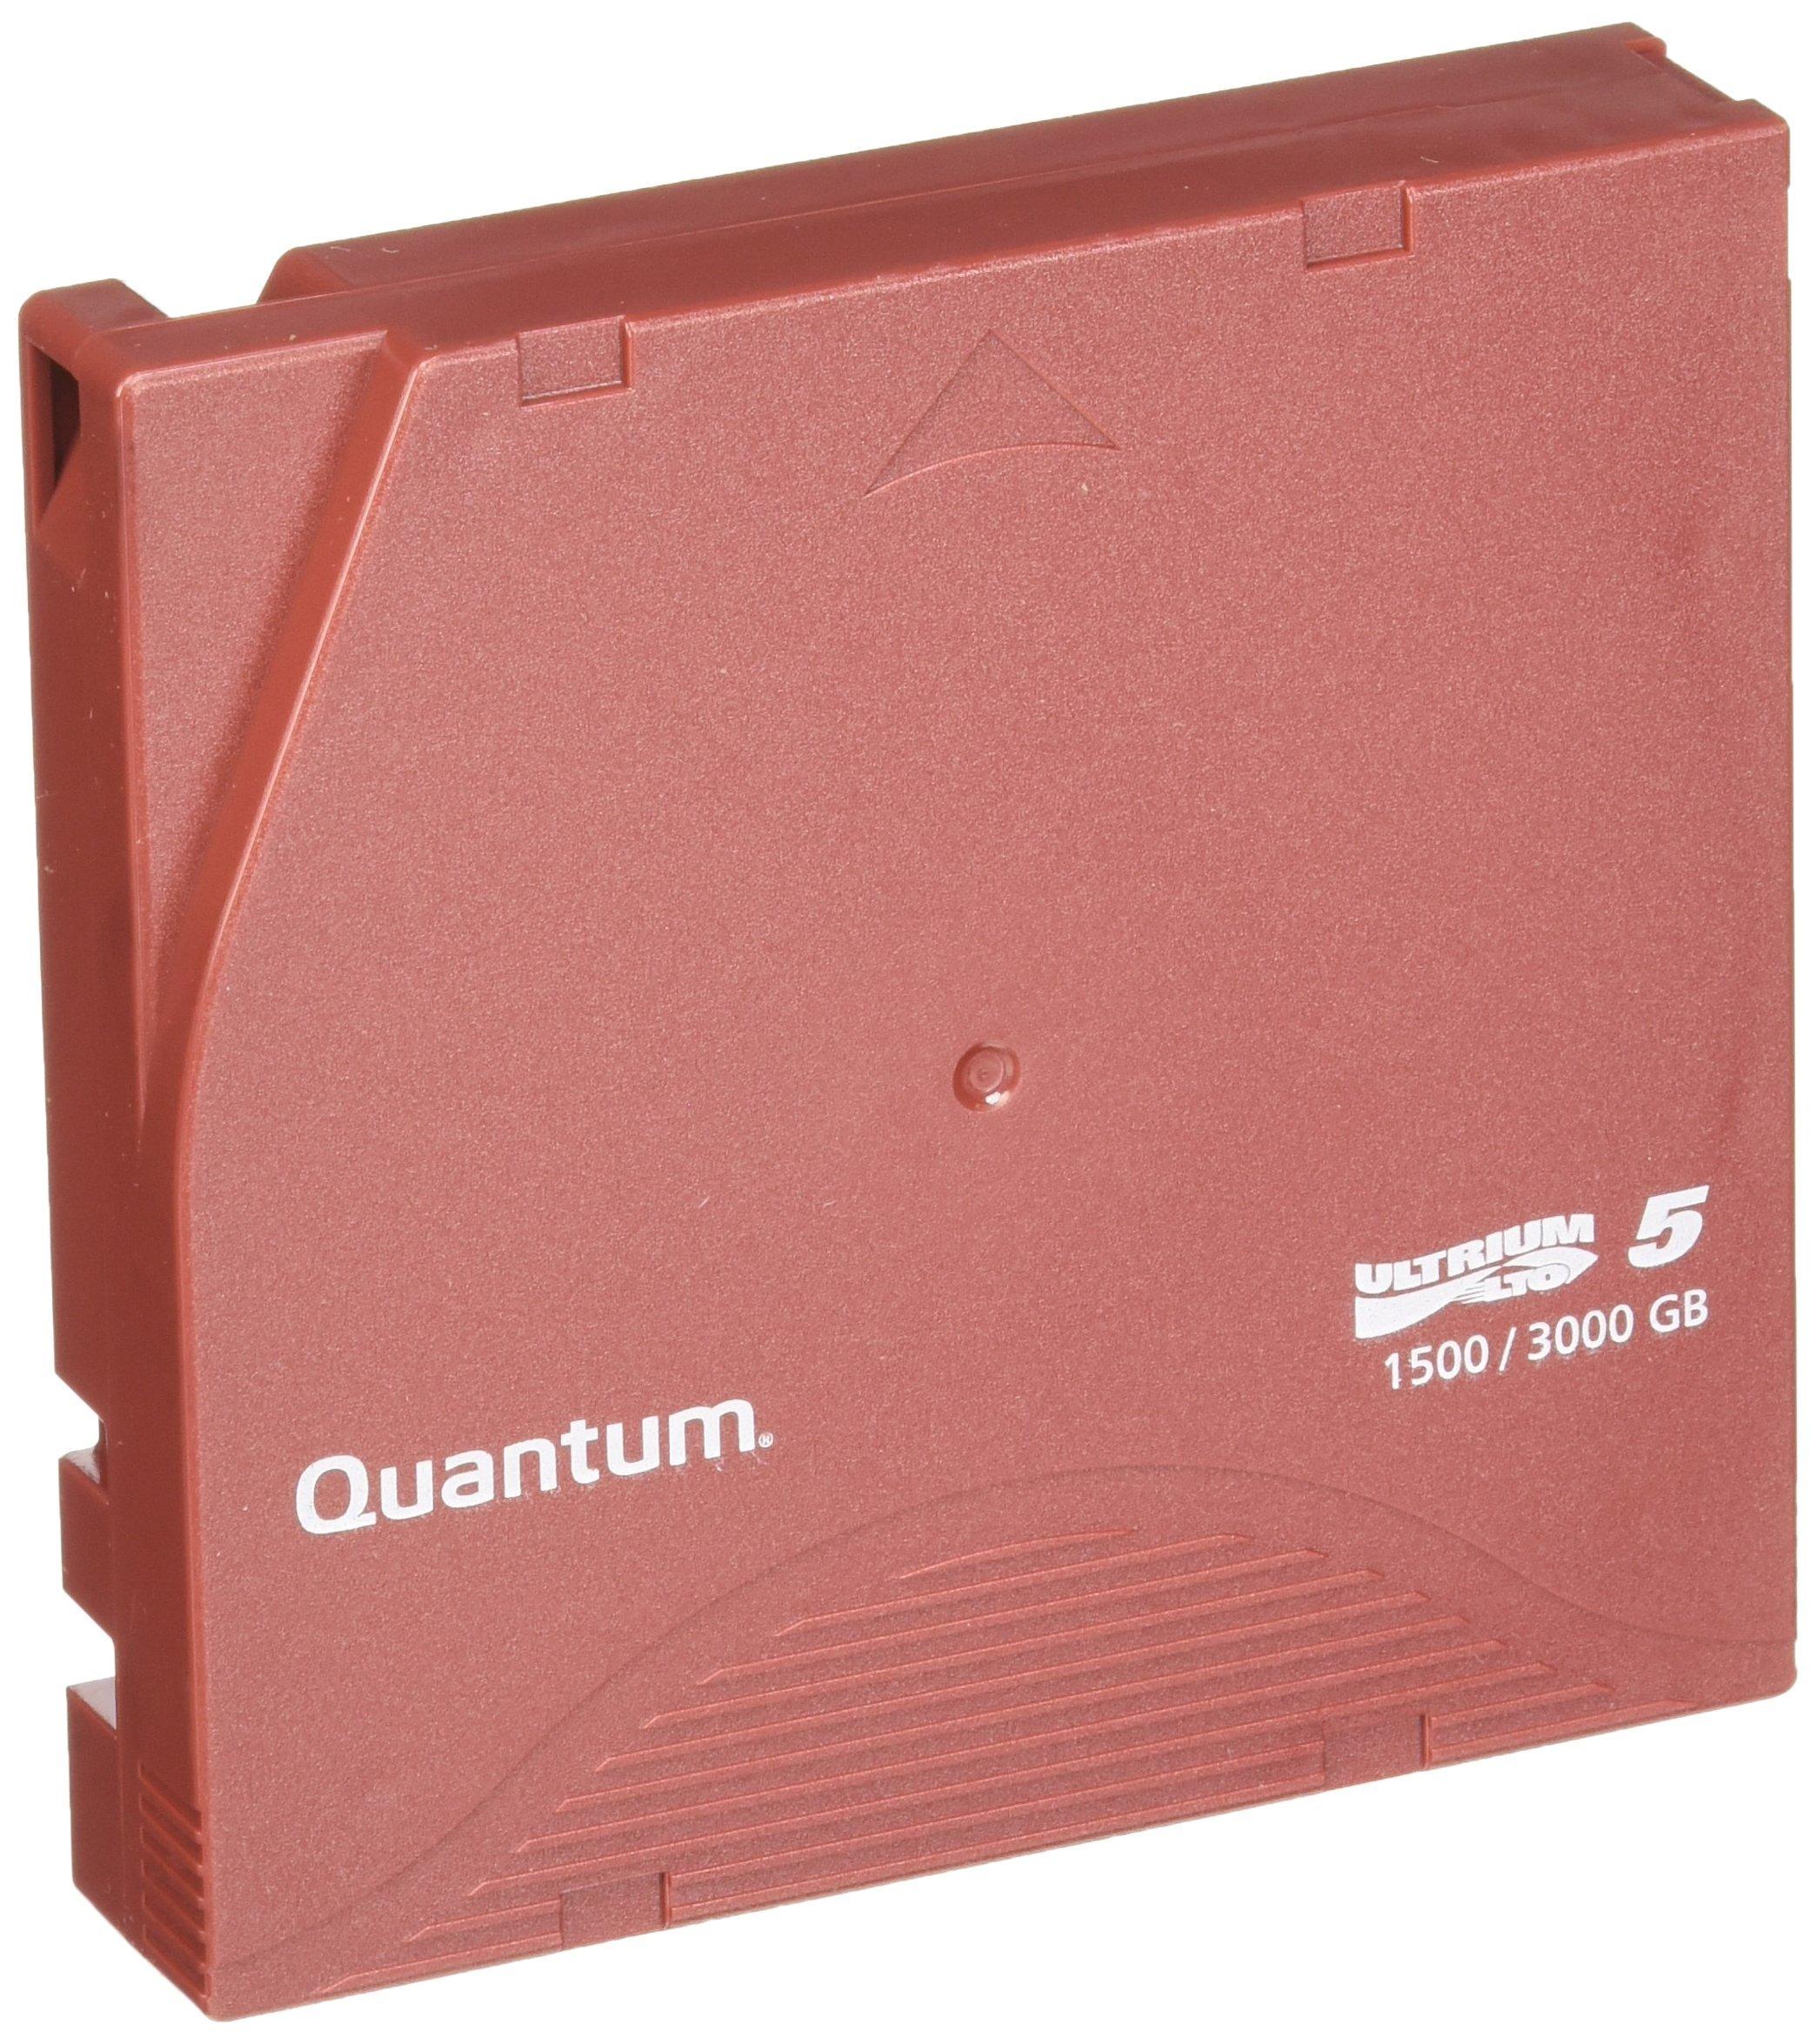 Quantum LTO-5 MR-L5MQN-01 Ultrium-5 Data Tape Cartridge (1.5/3.0TB) 10 Count